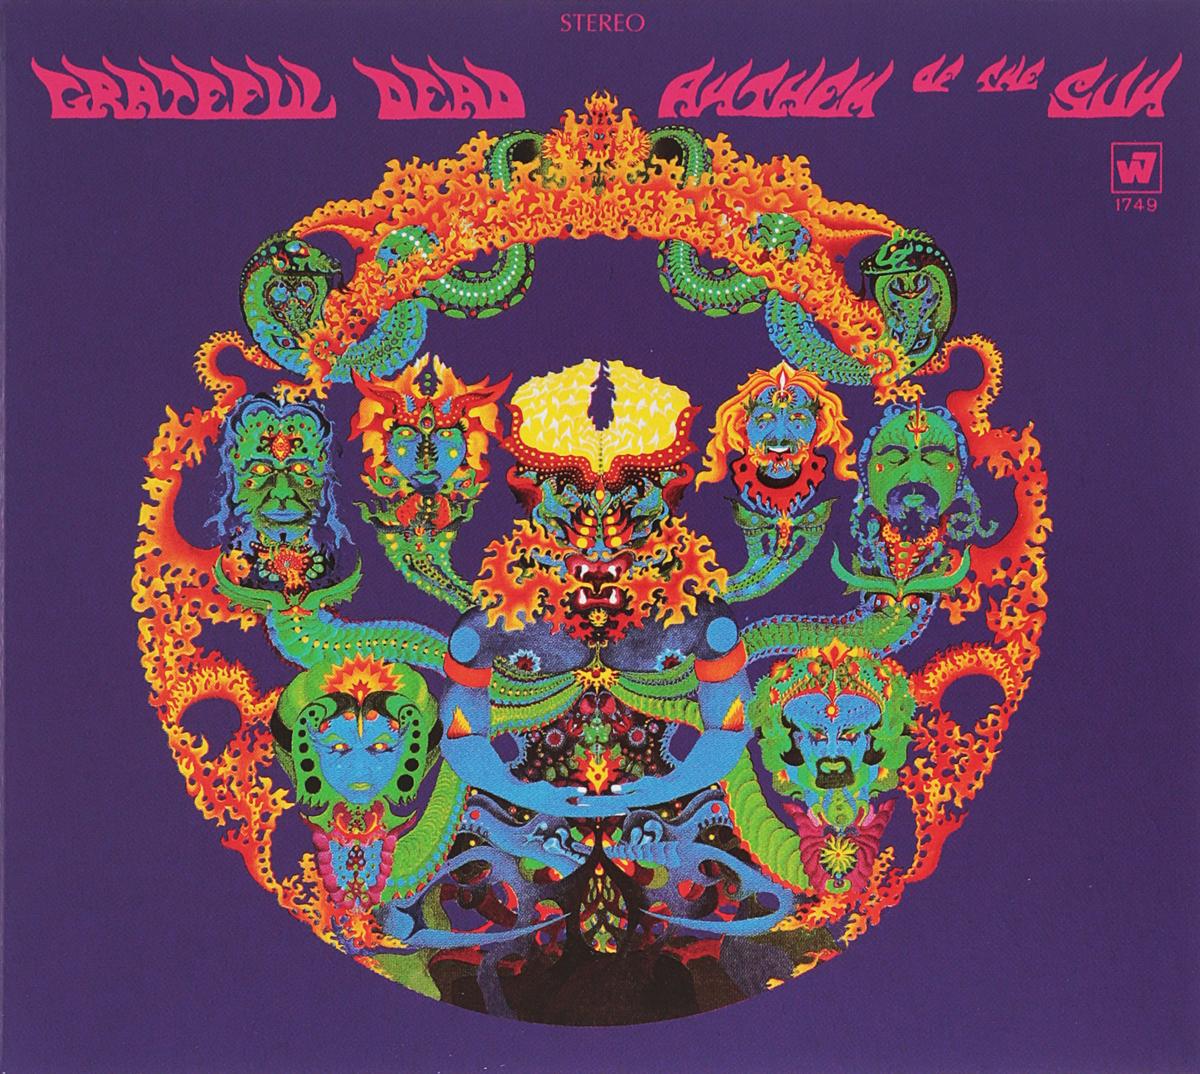 цена на The Grateful Dead Grateful Dead. Anthem Of The Sun (50th Anniversary Deluxe Edition) (2 CD)